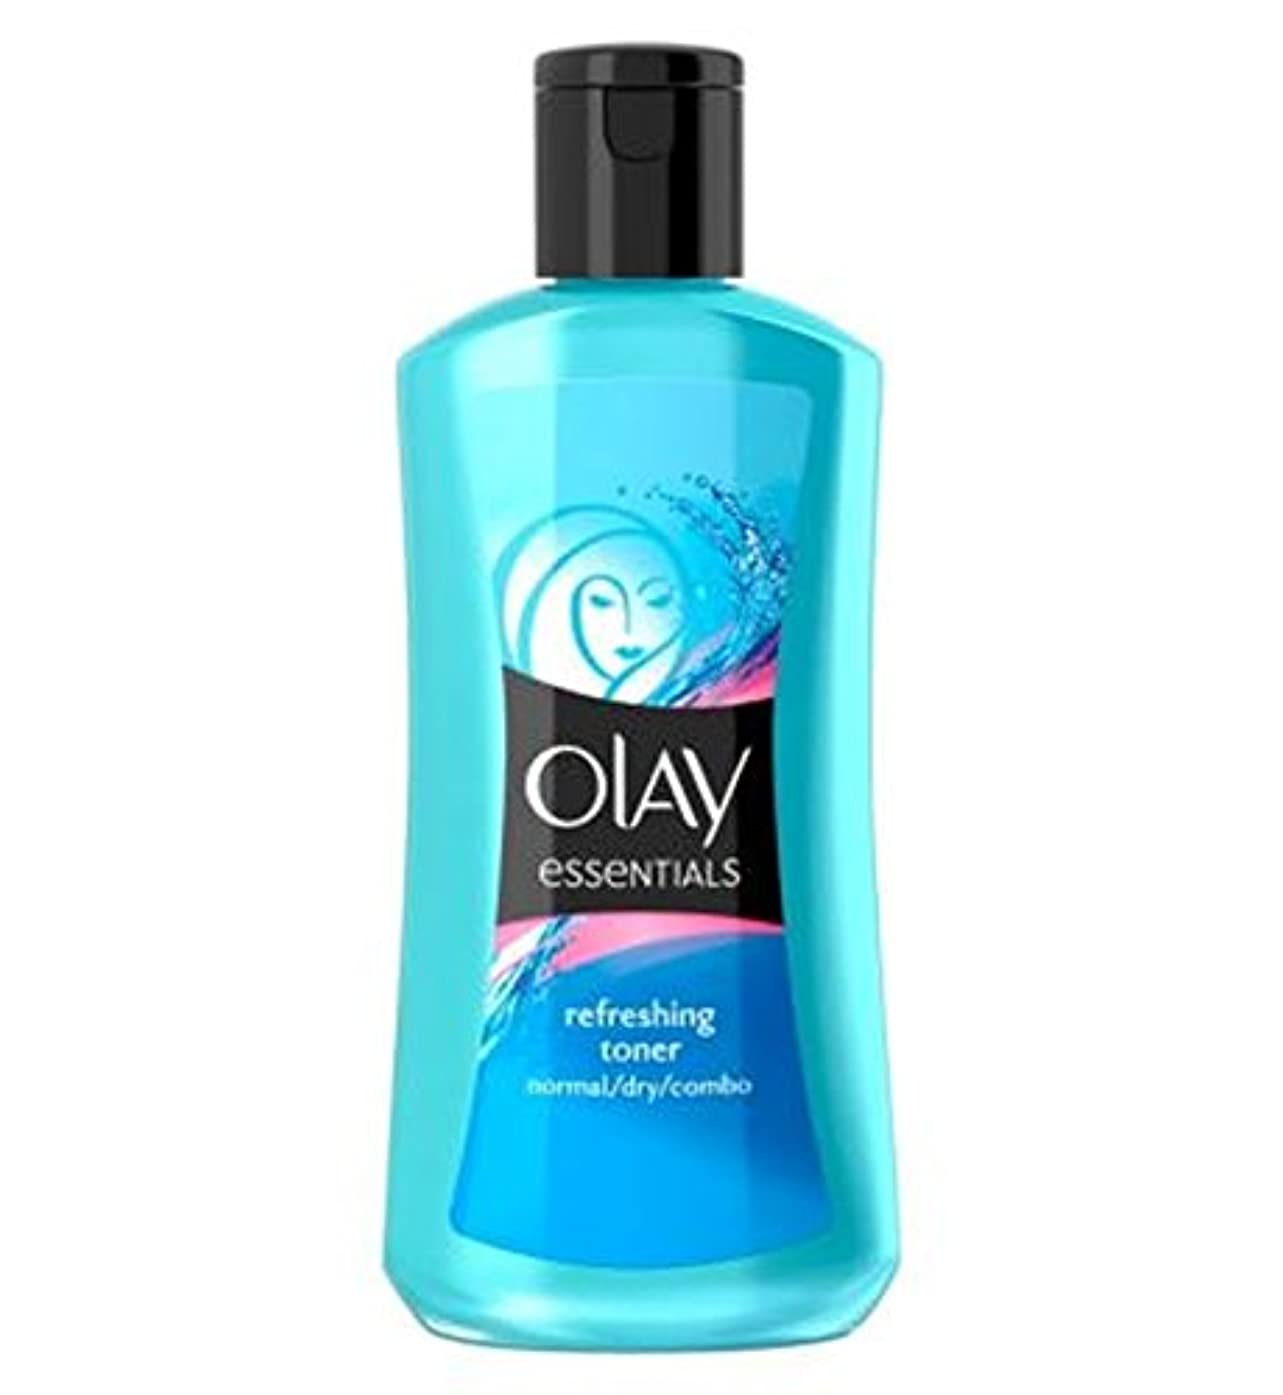 Olay 2in1 Cleanser & Toner 200ml - オーレイの2In1クレンザー&トナー200ミリリットル (Olay) [並行輸入品]